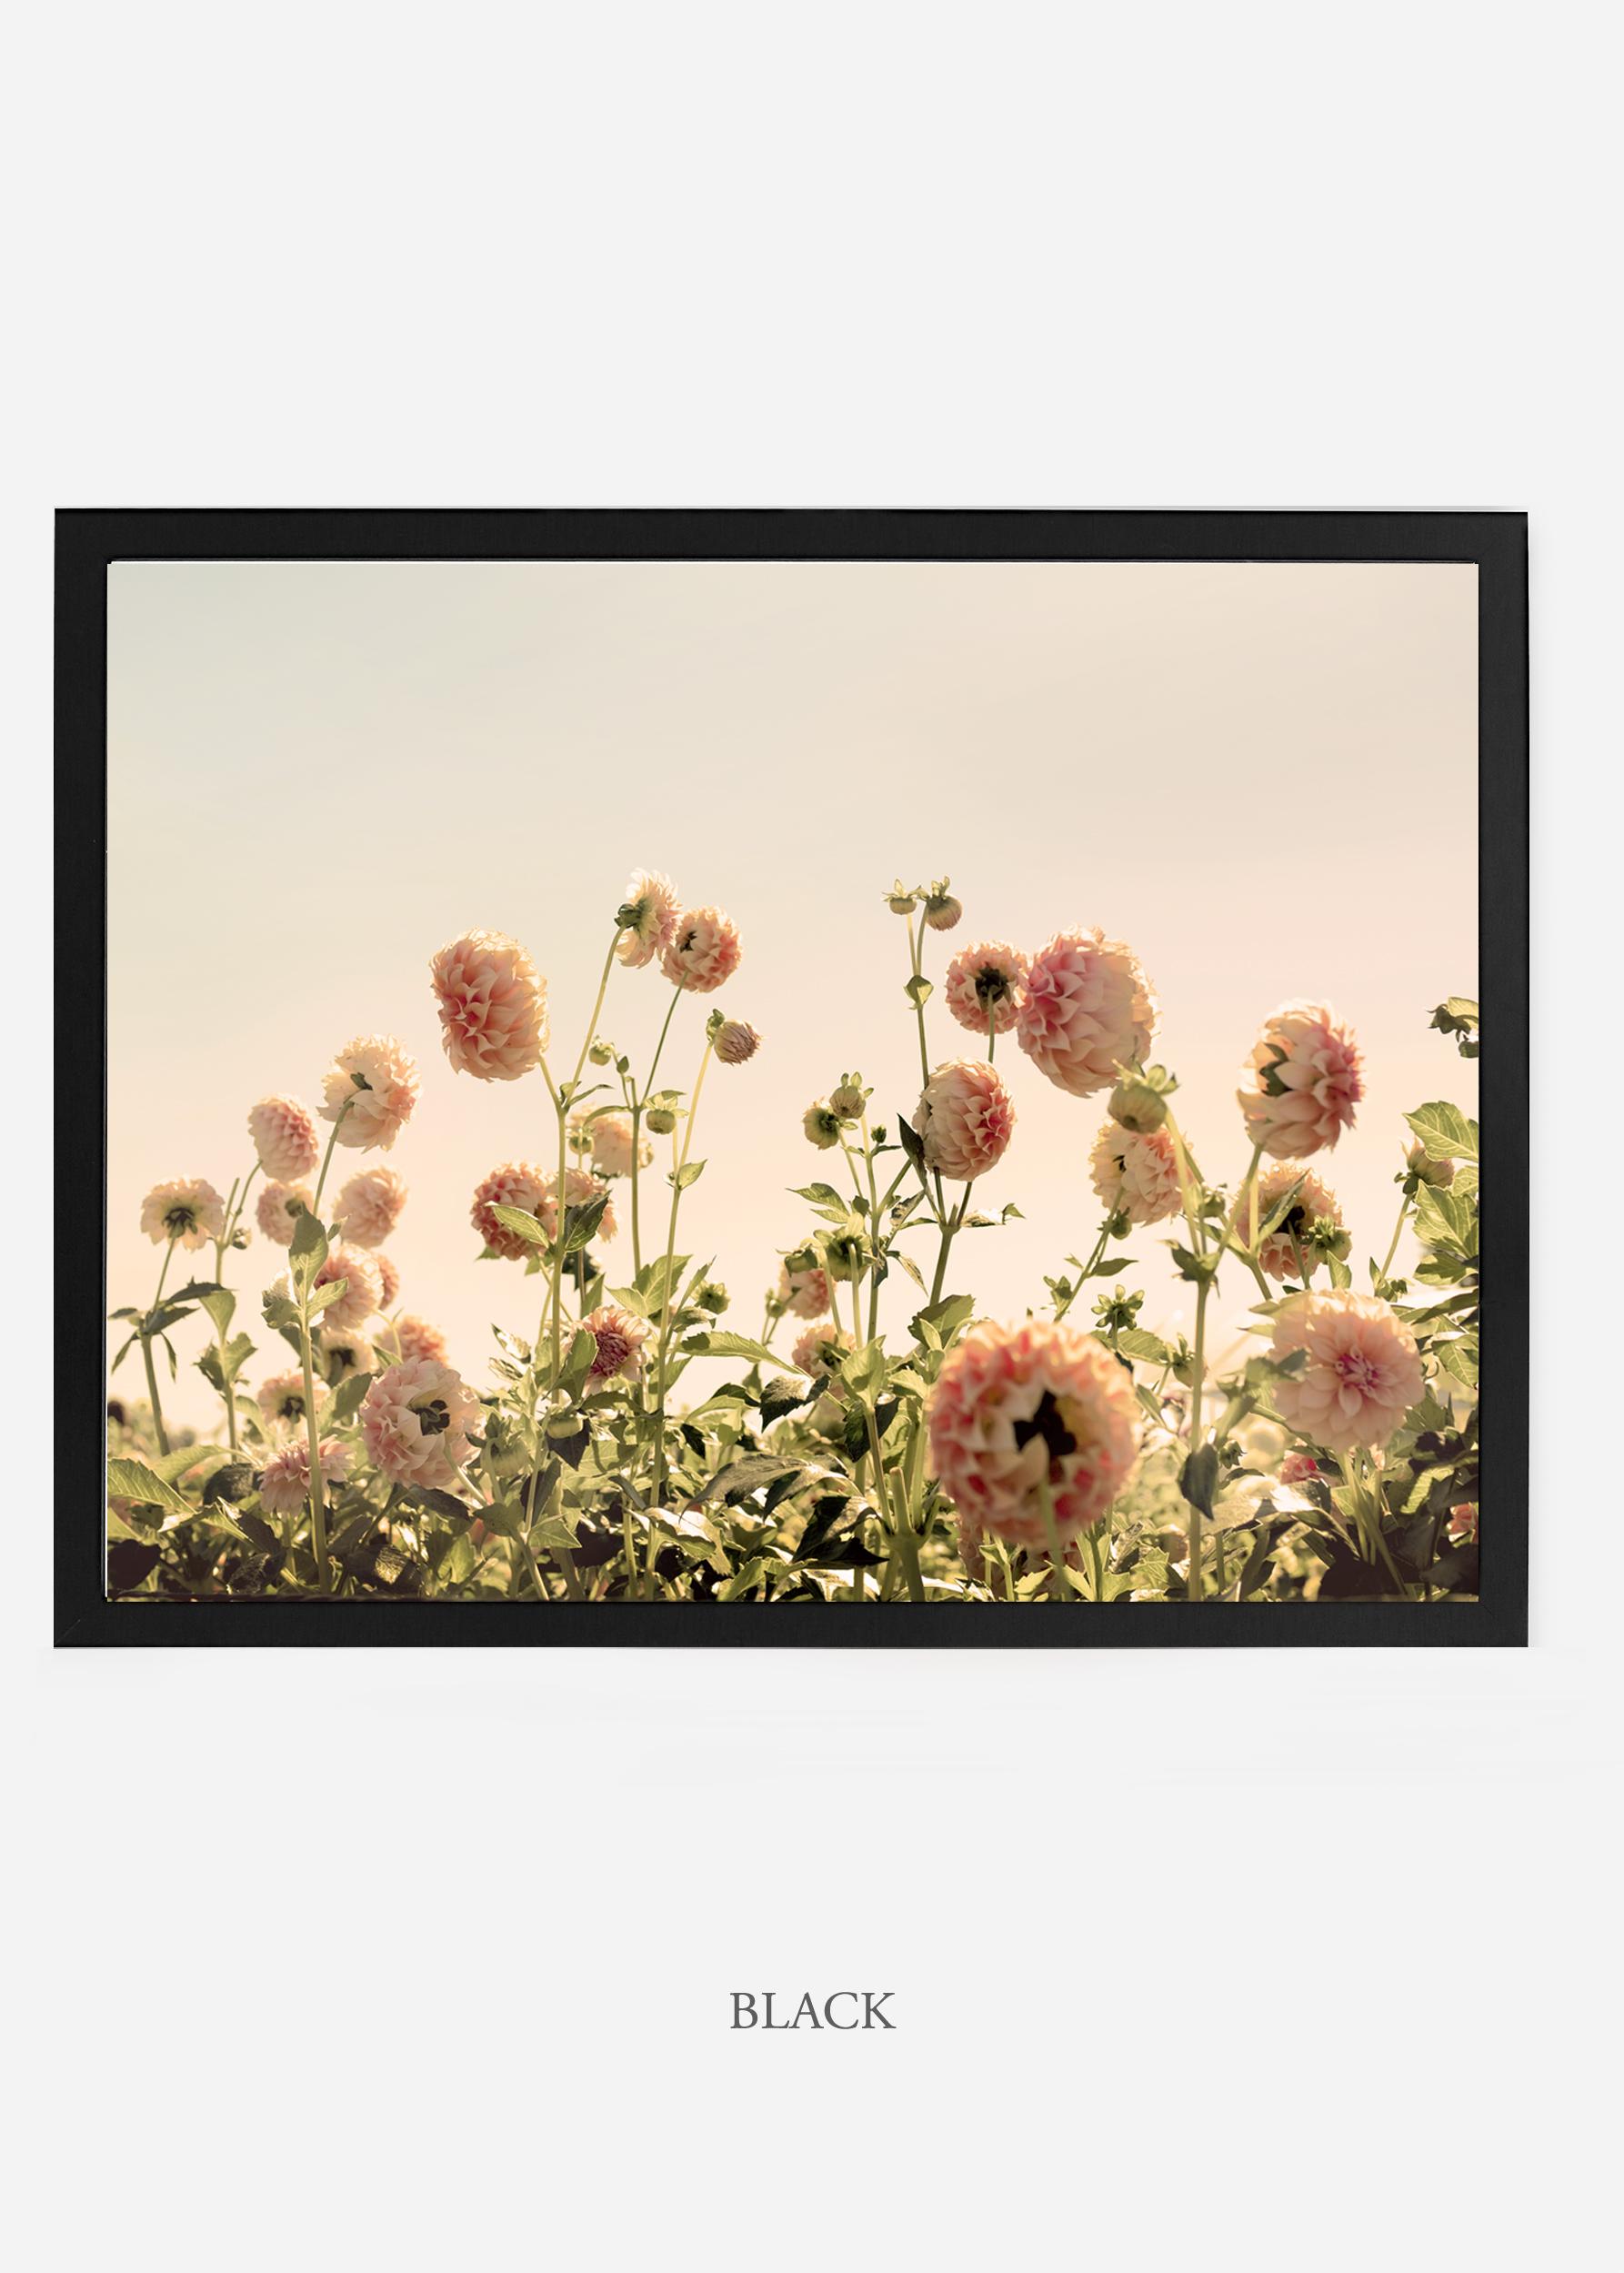 NoMat_BlackFrame_DahliaNo.1_WilderCalifornia_Art_Floral_Homedecor_Prints_Dahlia_Botanical_Artwork_Interiordesign.jpg